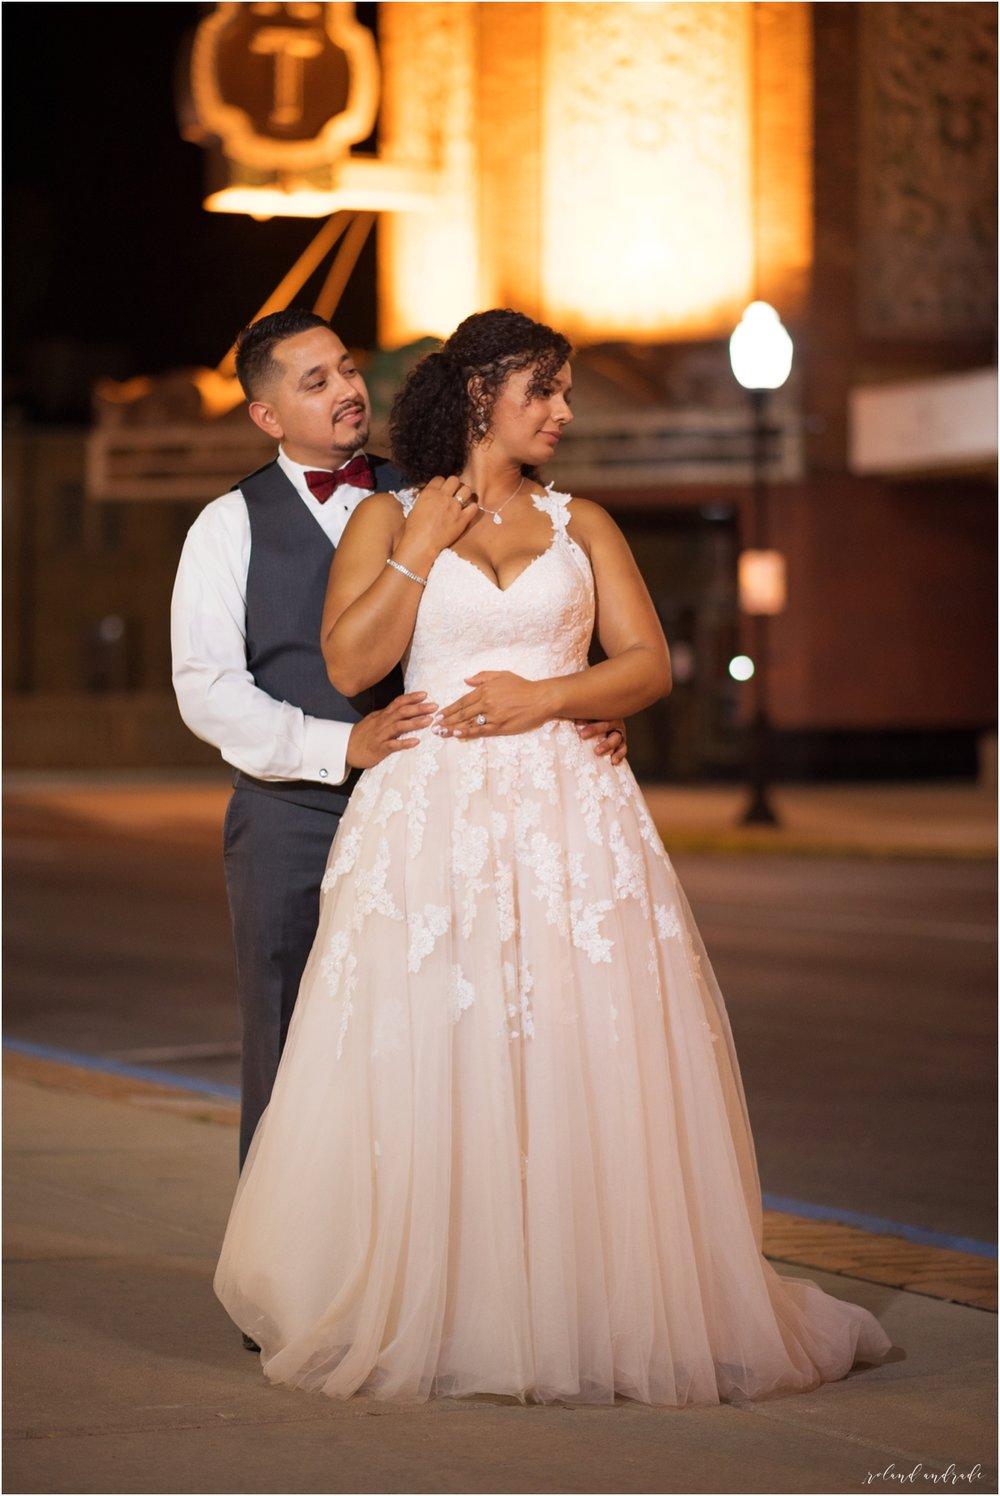 Paramount Theater Meyer Ballroom Wedding Photography Aurora Illinois - Chicago Wedding Photography_0055.jpg